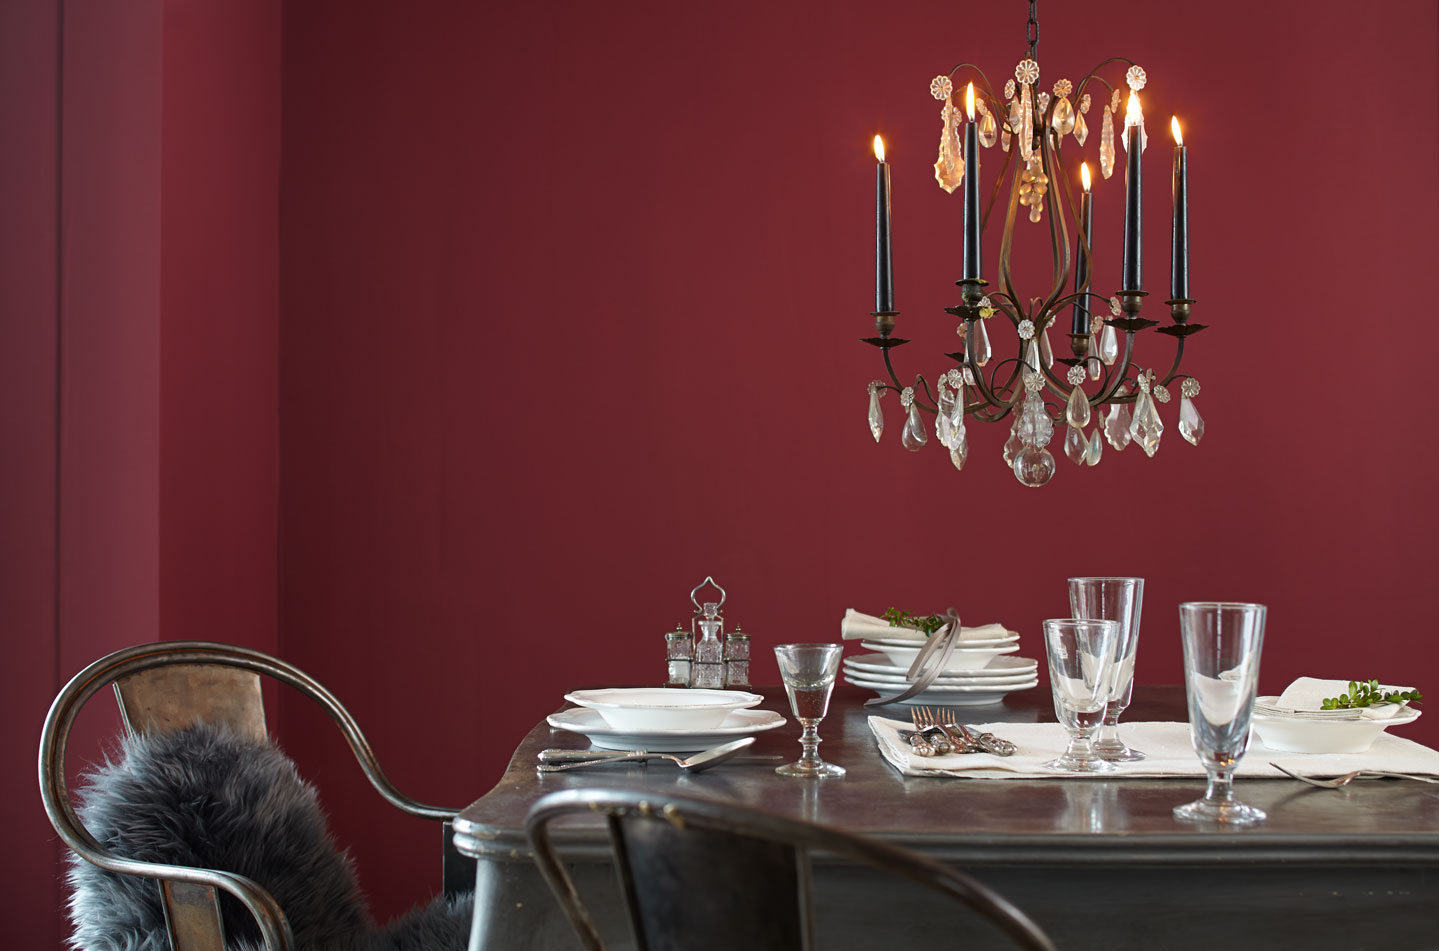 alpina feine farben edelmatte wandfarben in rot alpina farben. Black Bedroom Furniture Sets. Home Design Ideas